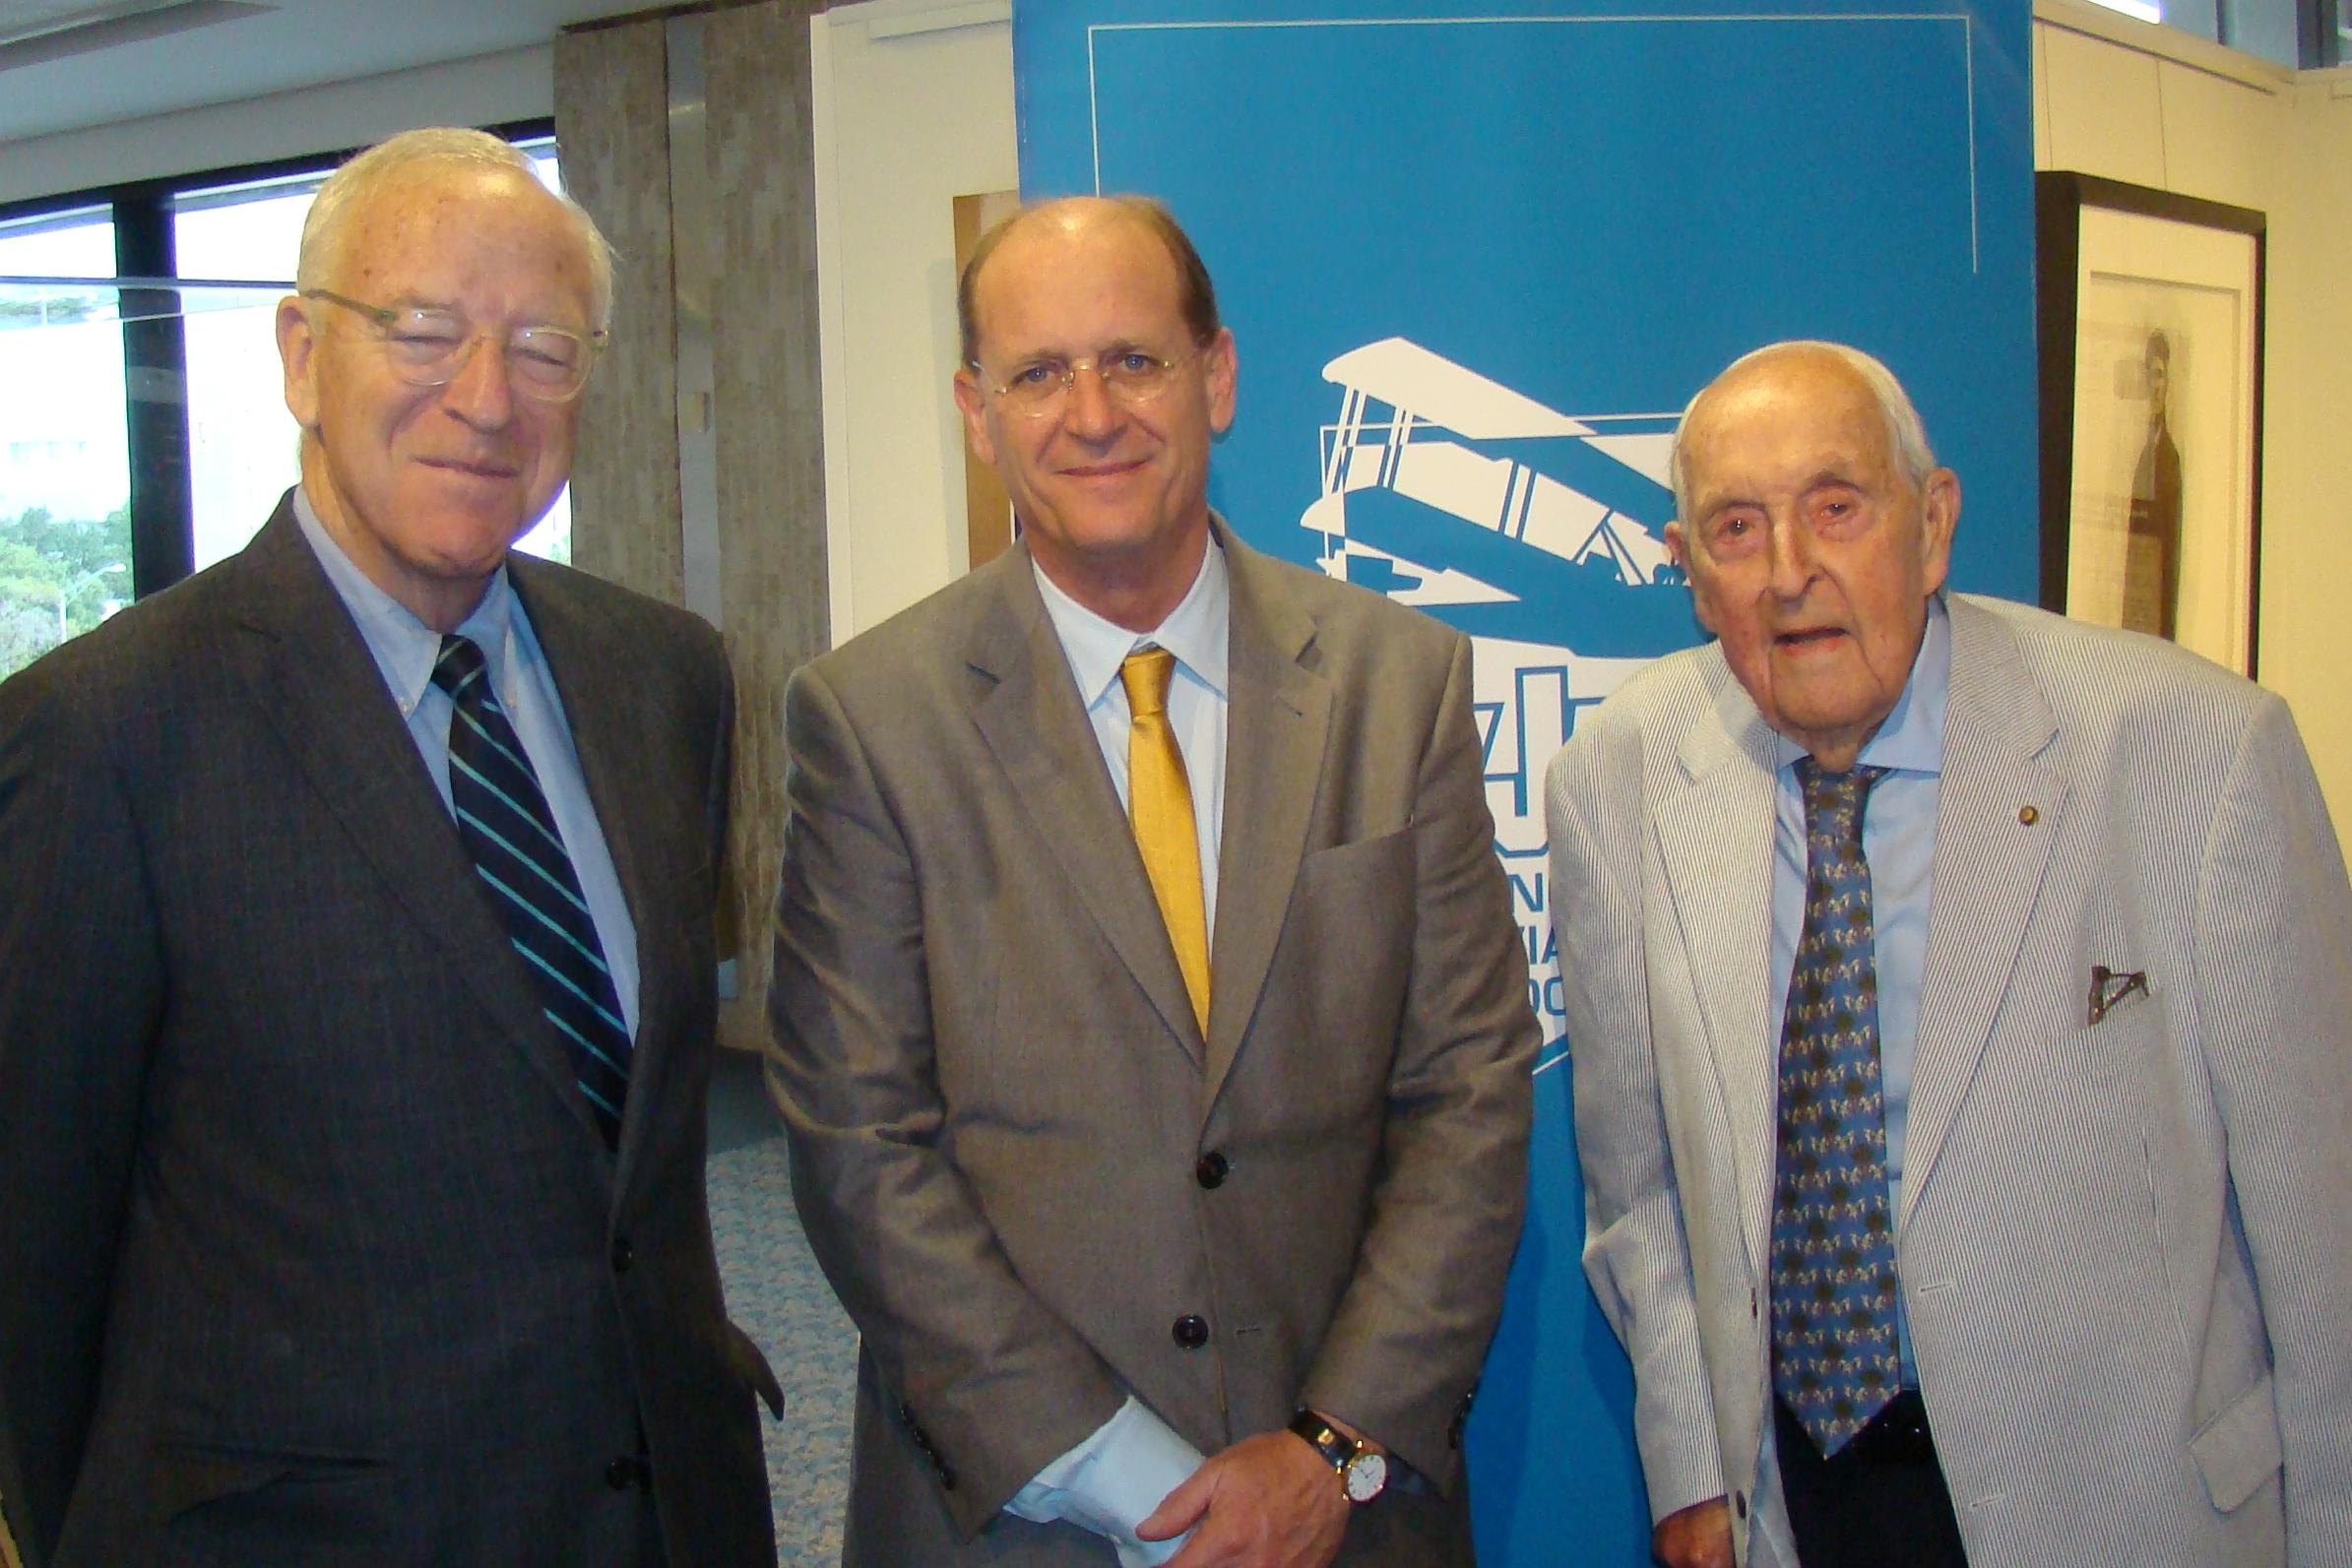 Bronson Thayer, Richard H. Anderson & Sir Lenox Hewitt - 1, 15 Nov '13.JPG